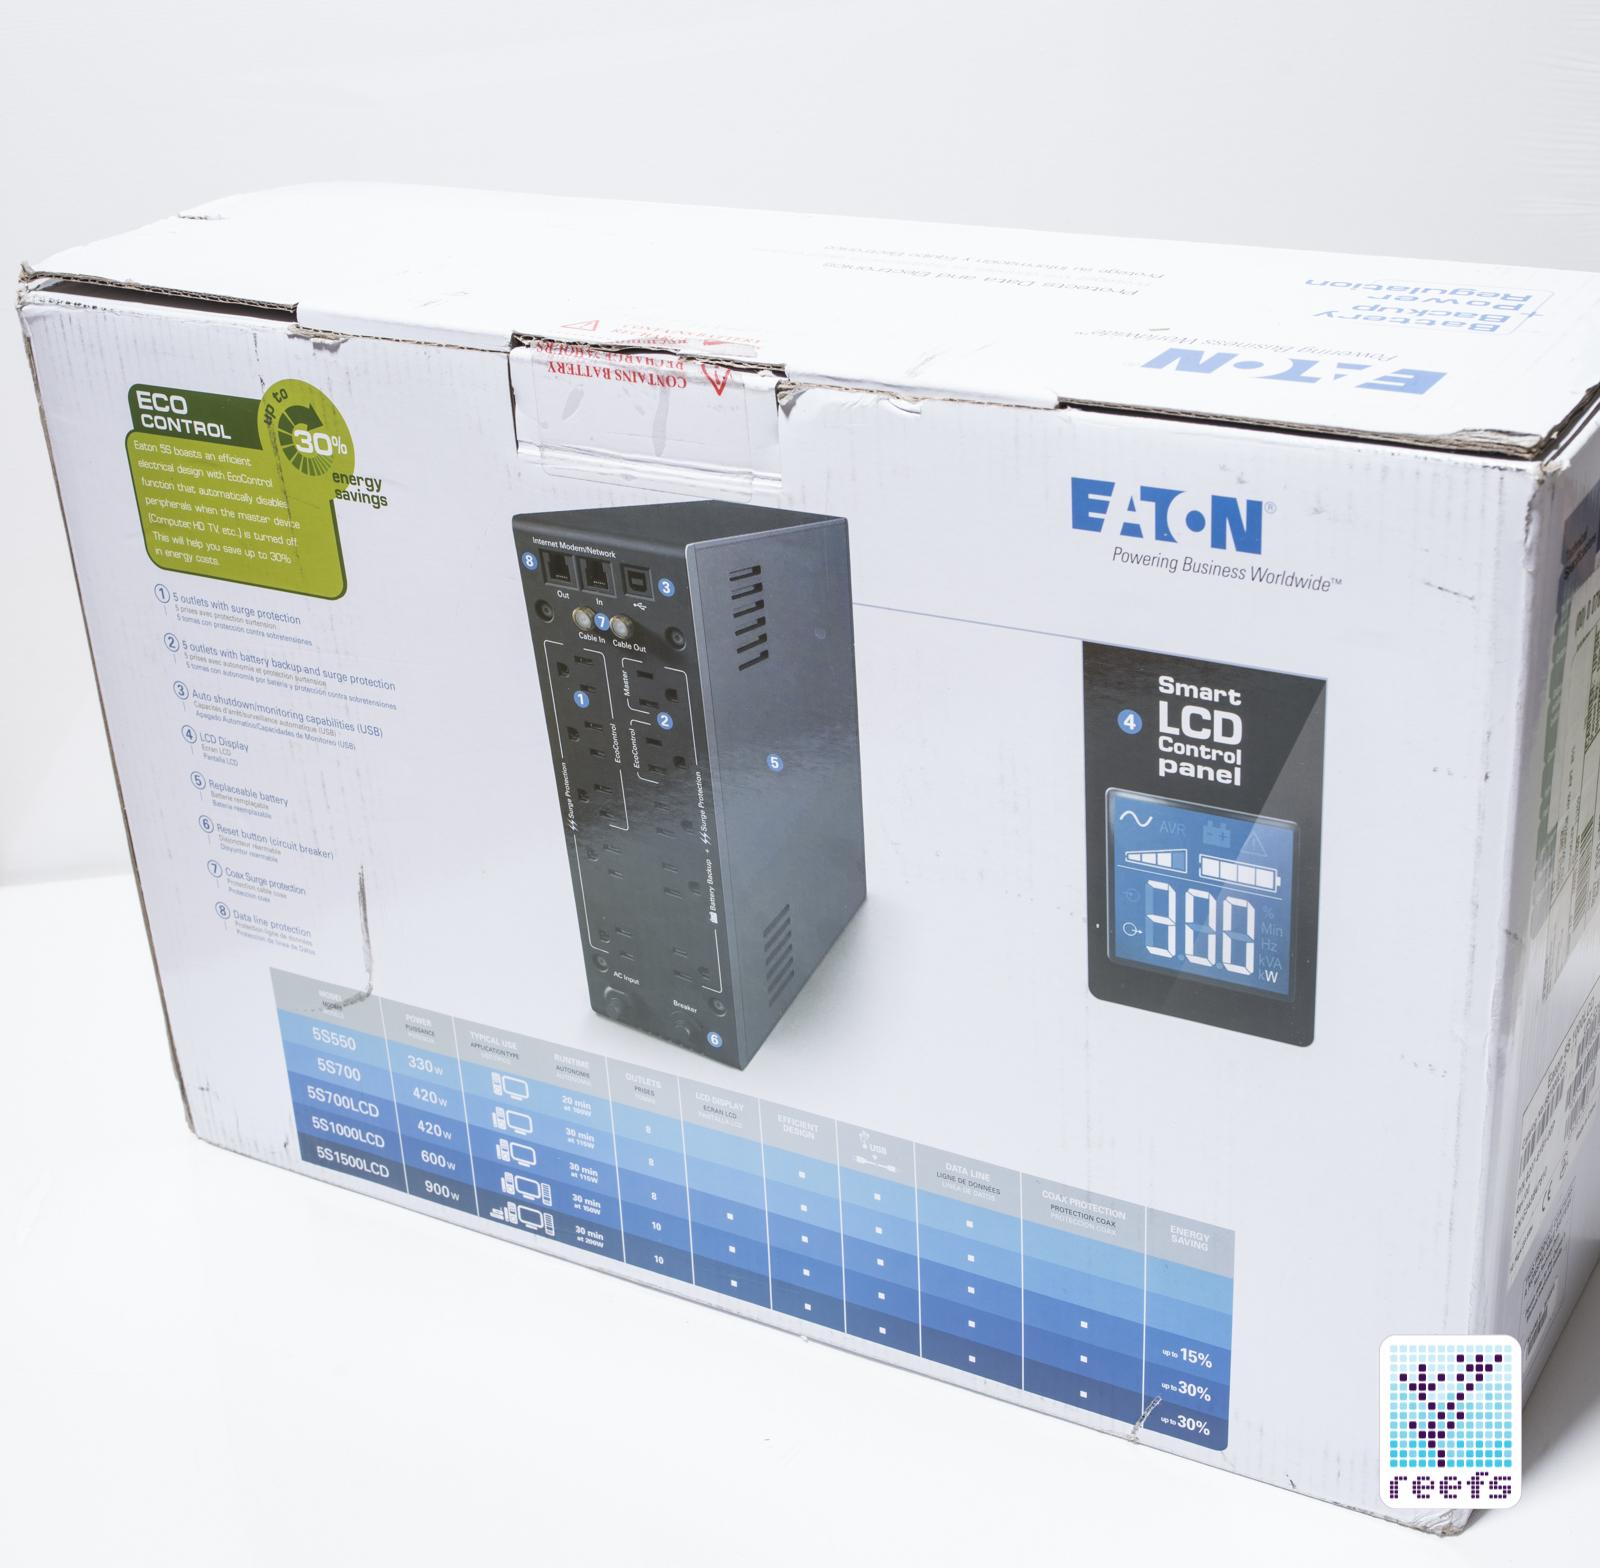 Eaton UPS unboxing